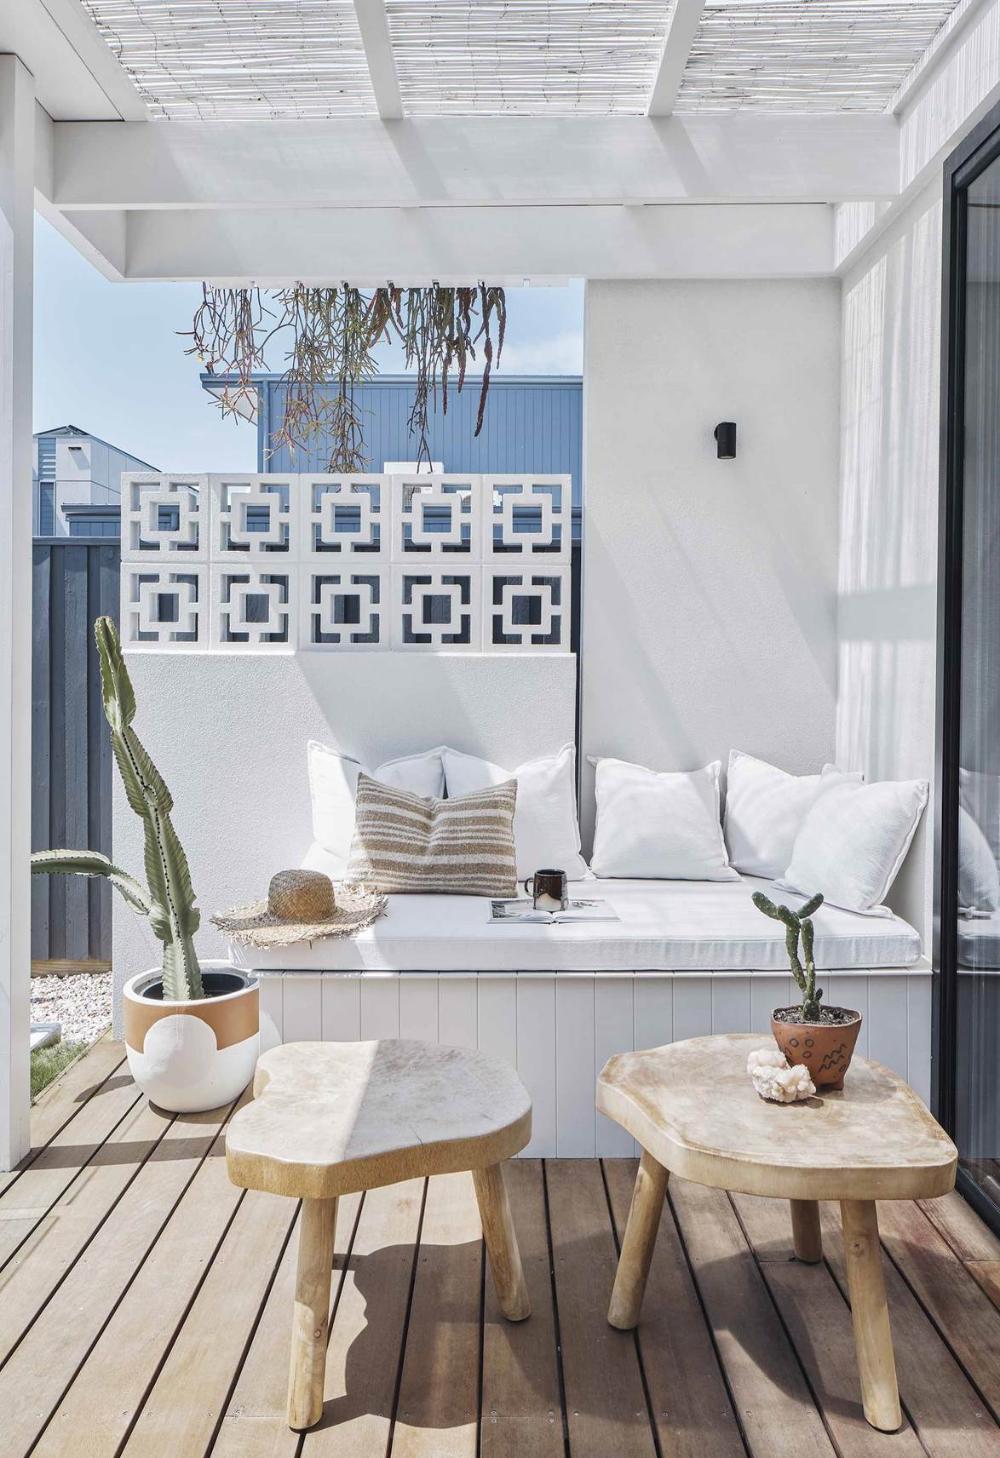 10 breeze block wall ideas worthy of Palm Springs in 2020